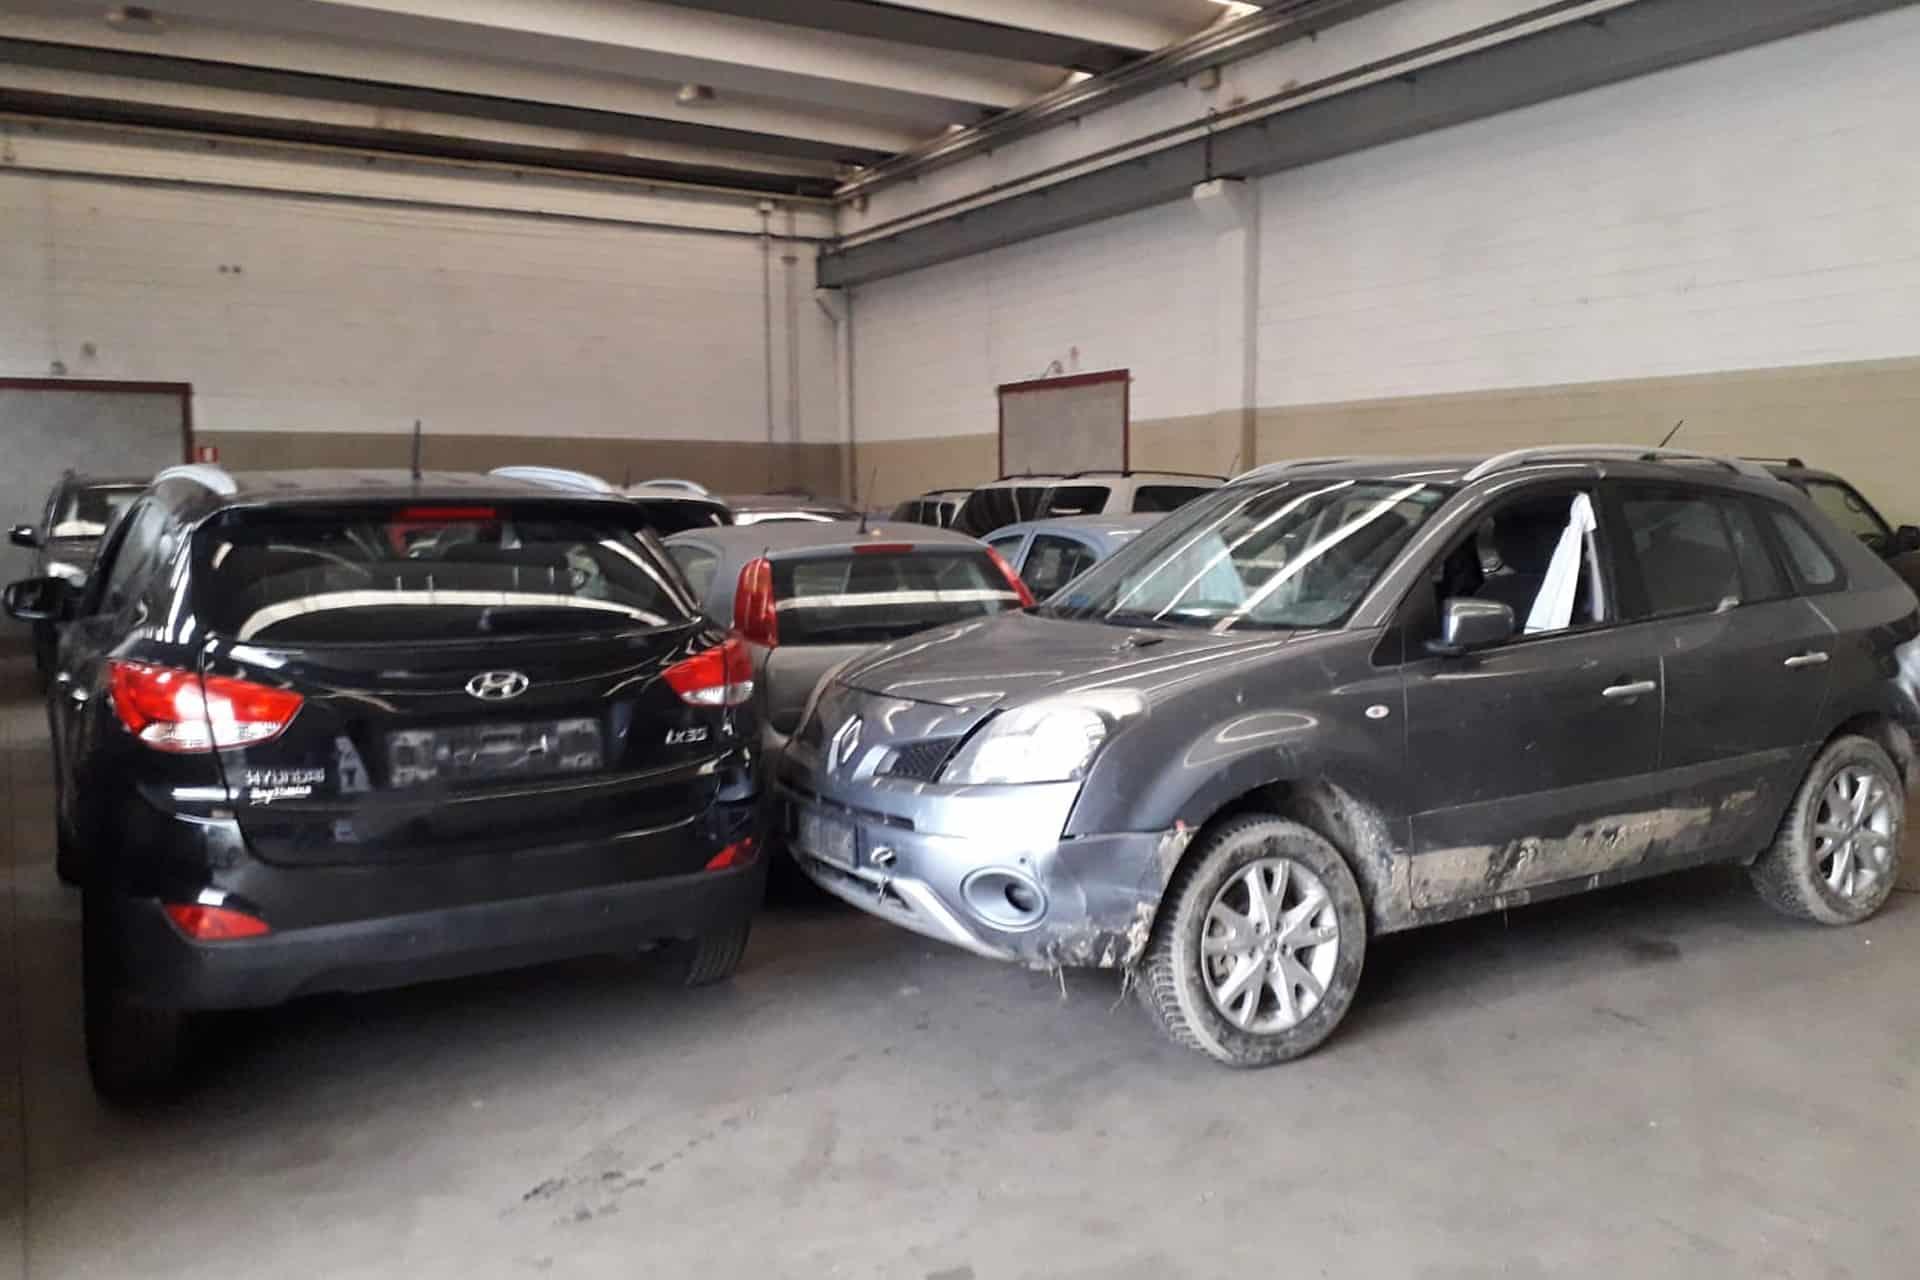 ritiro auto incidentate Piacenza